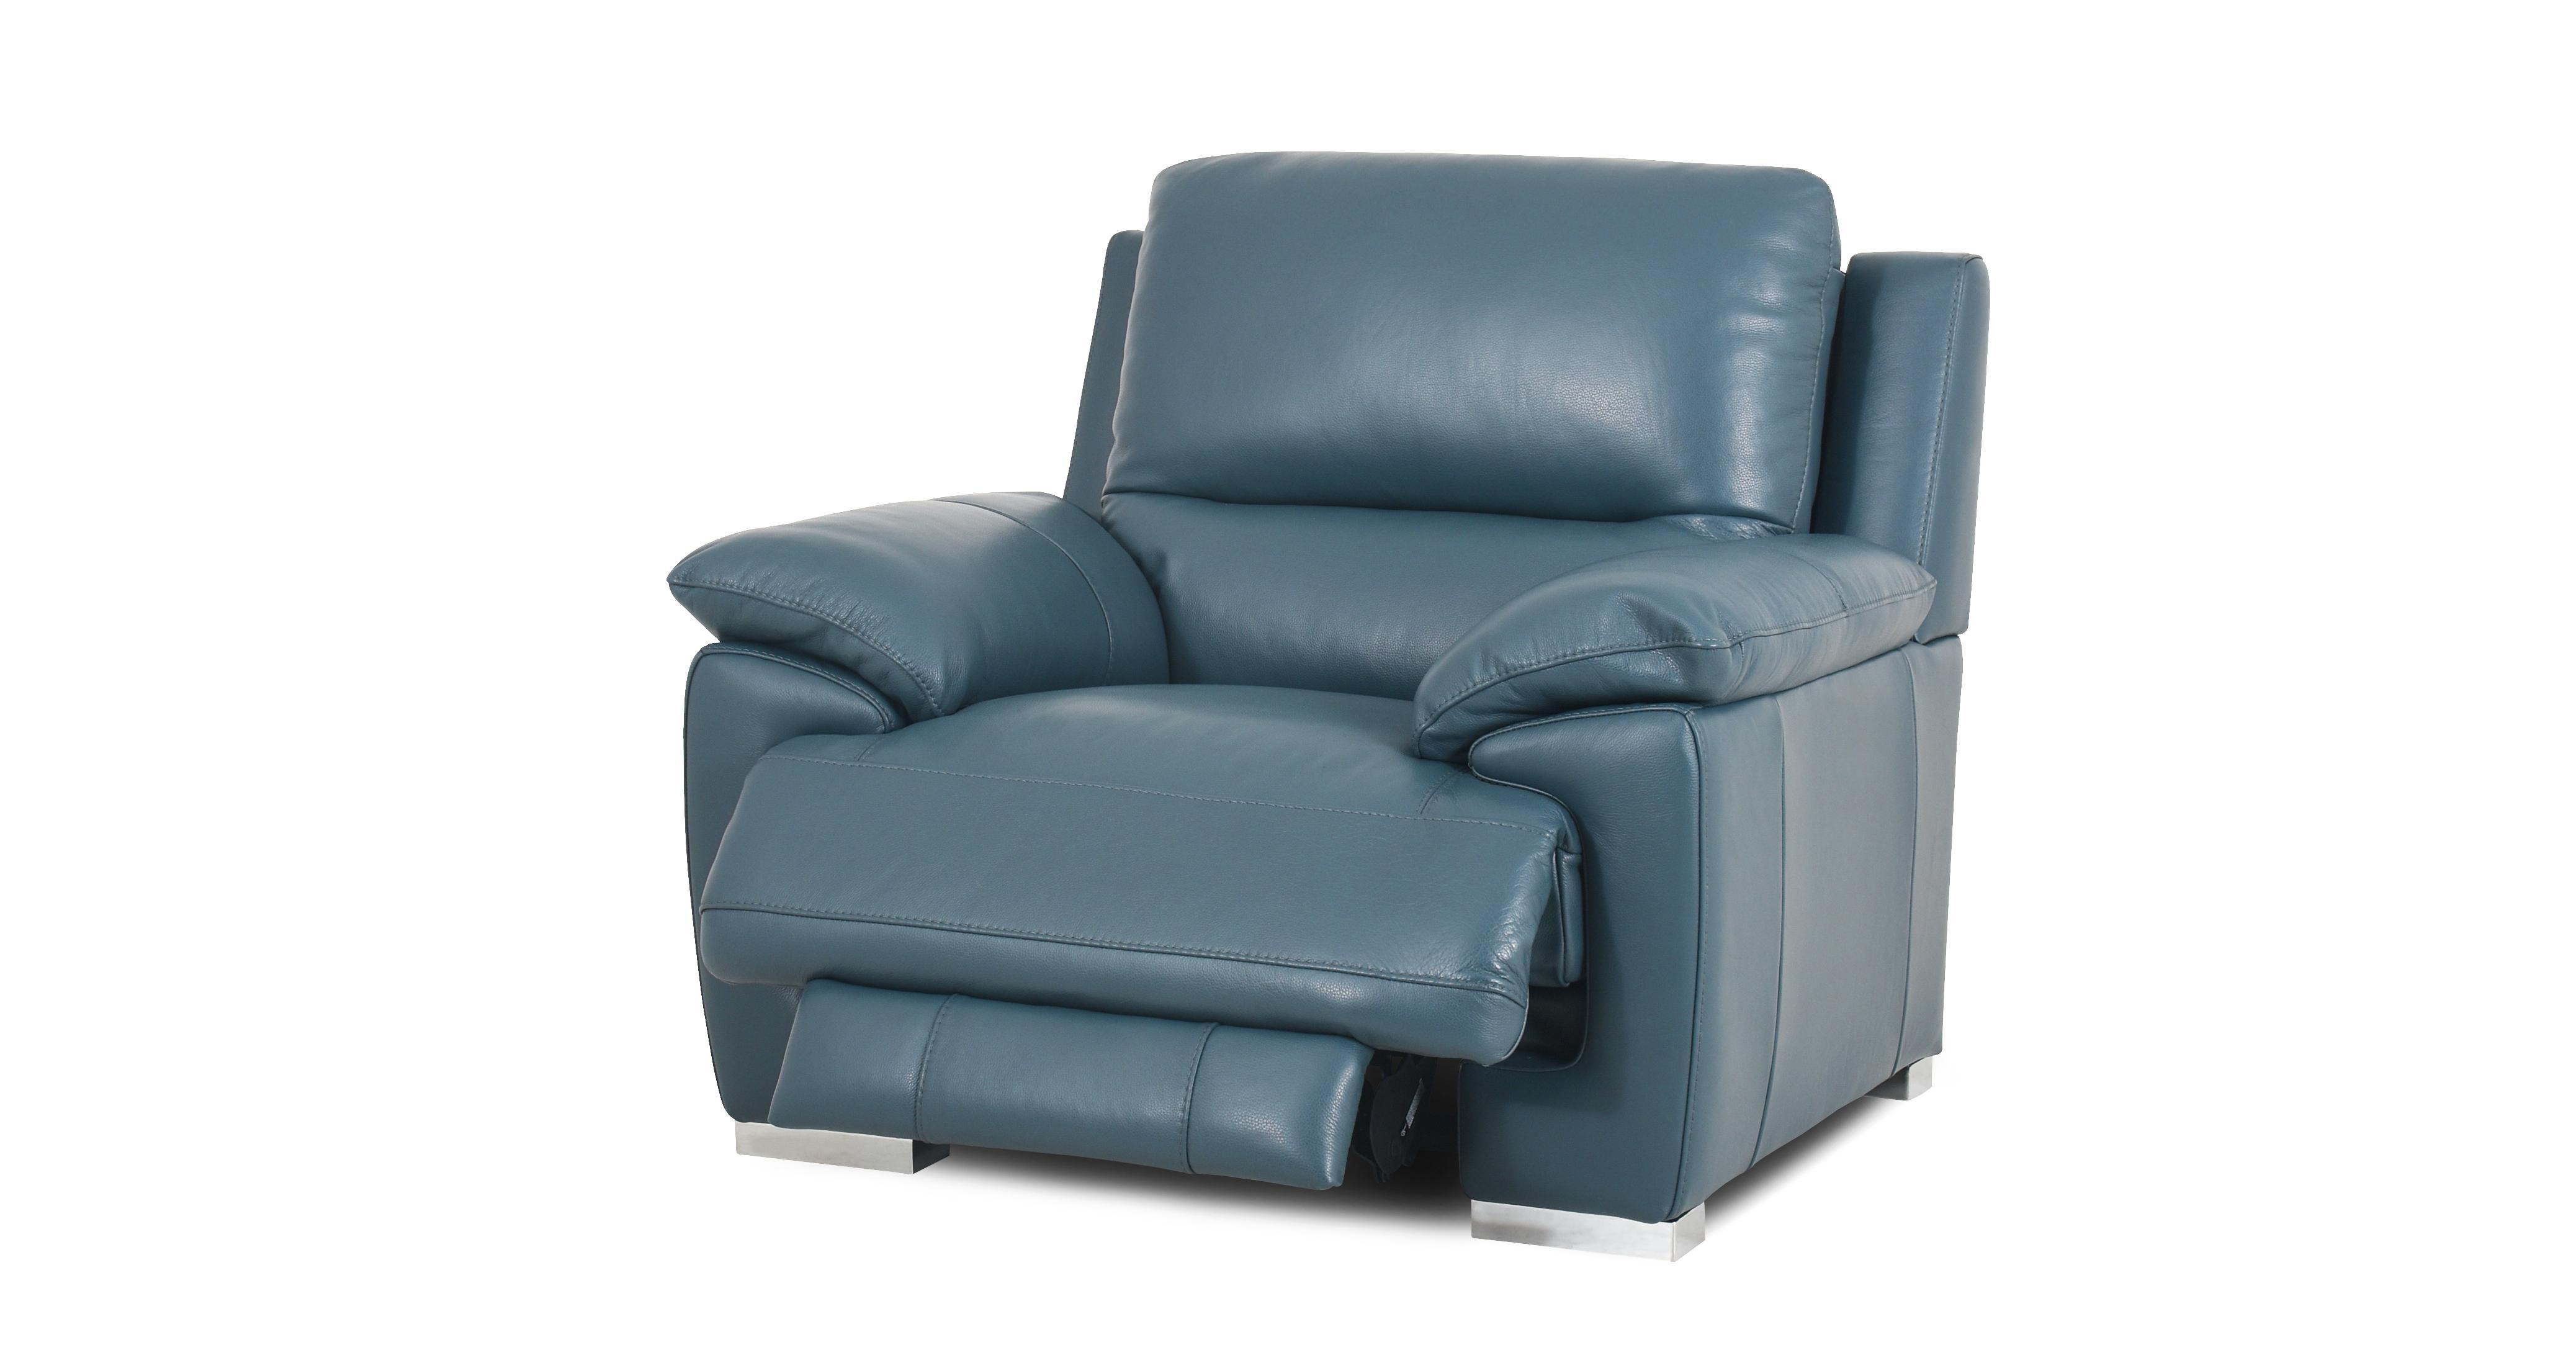 Stupendous Falcon Manual Recliner Chair Alphanode Cool Chair Designs And Ideas Alphanodeonline